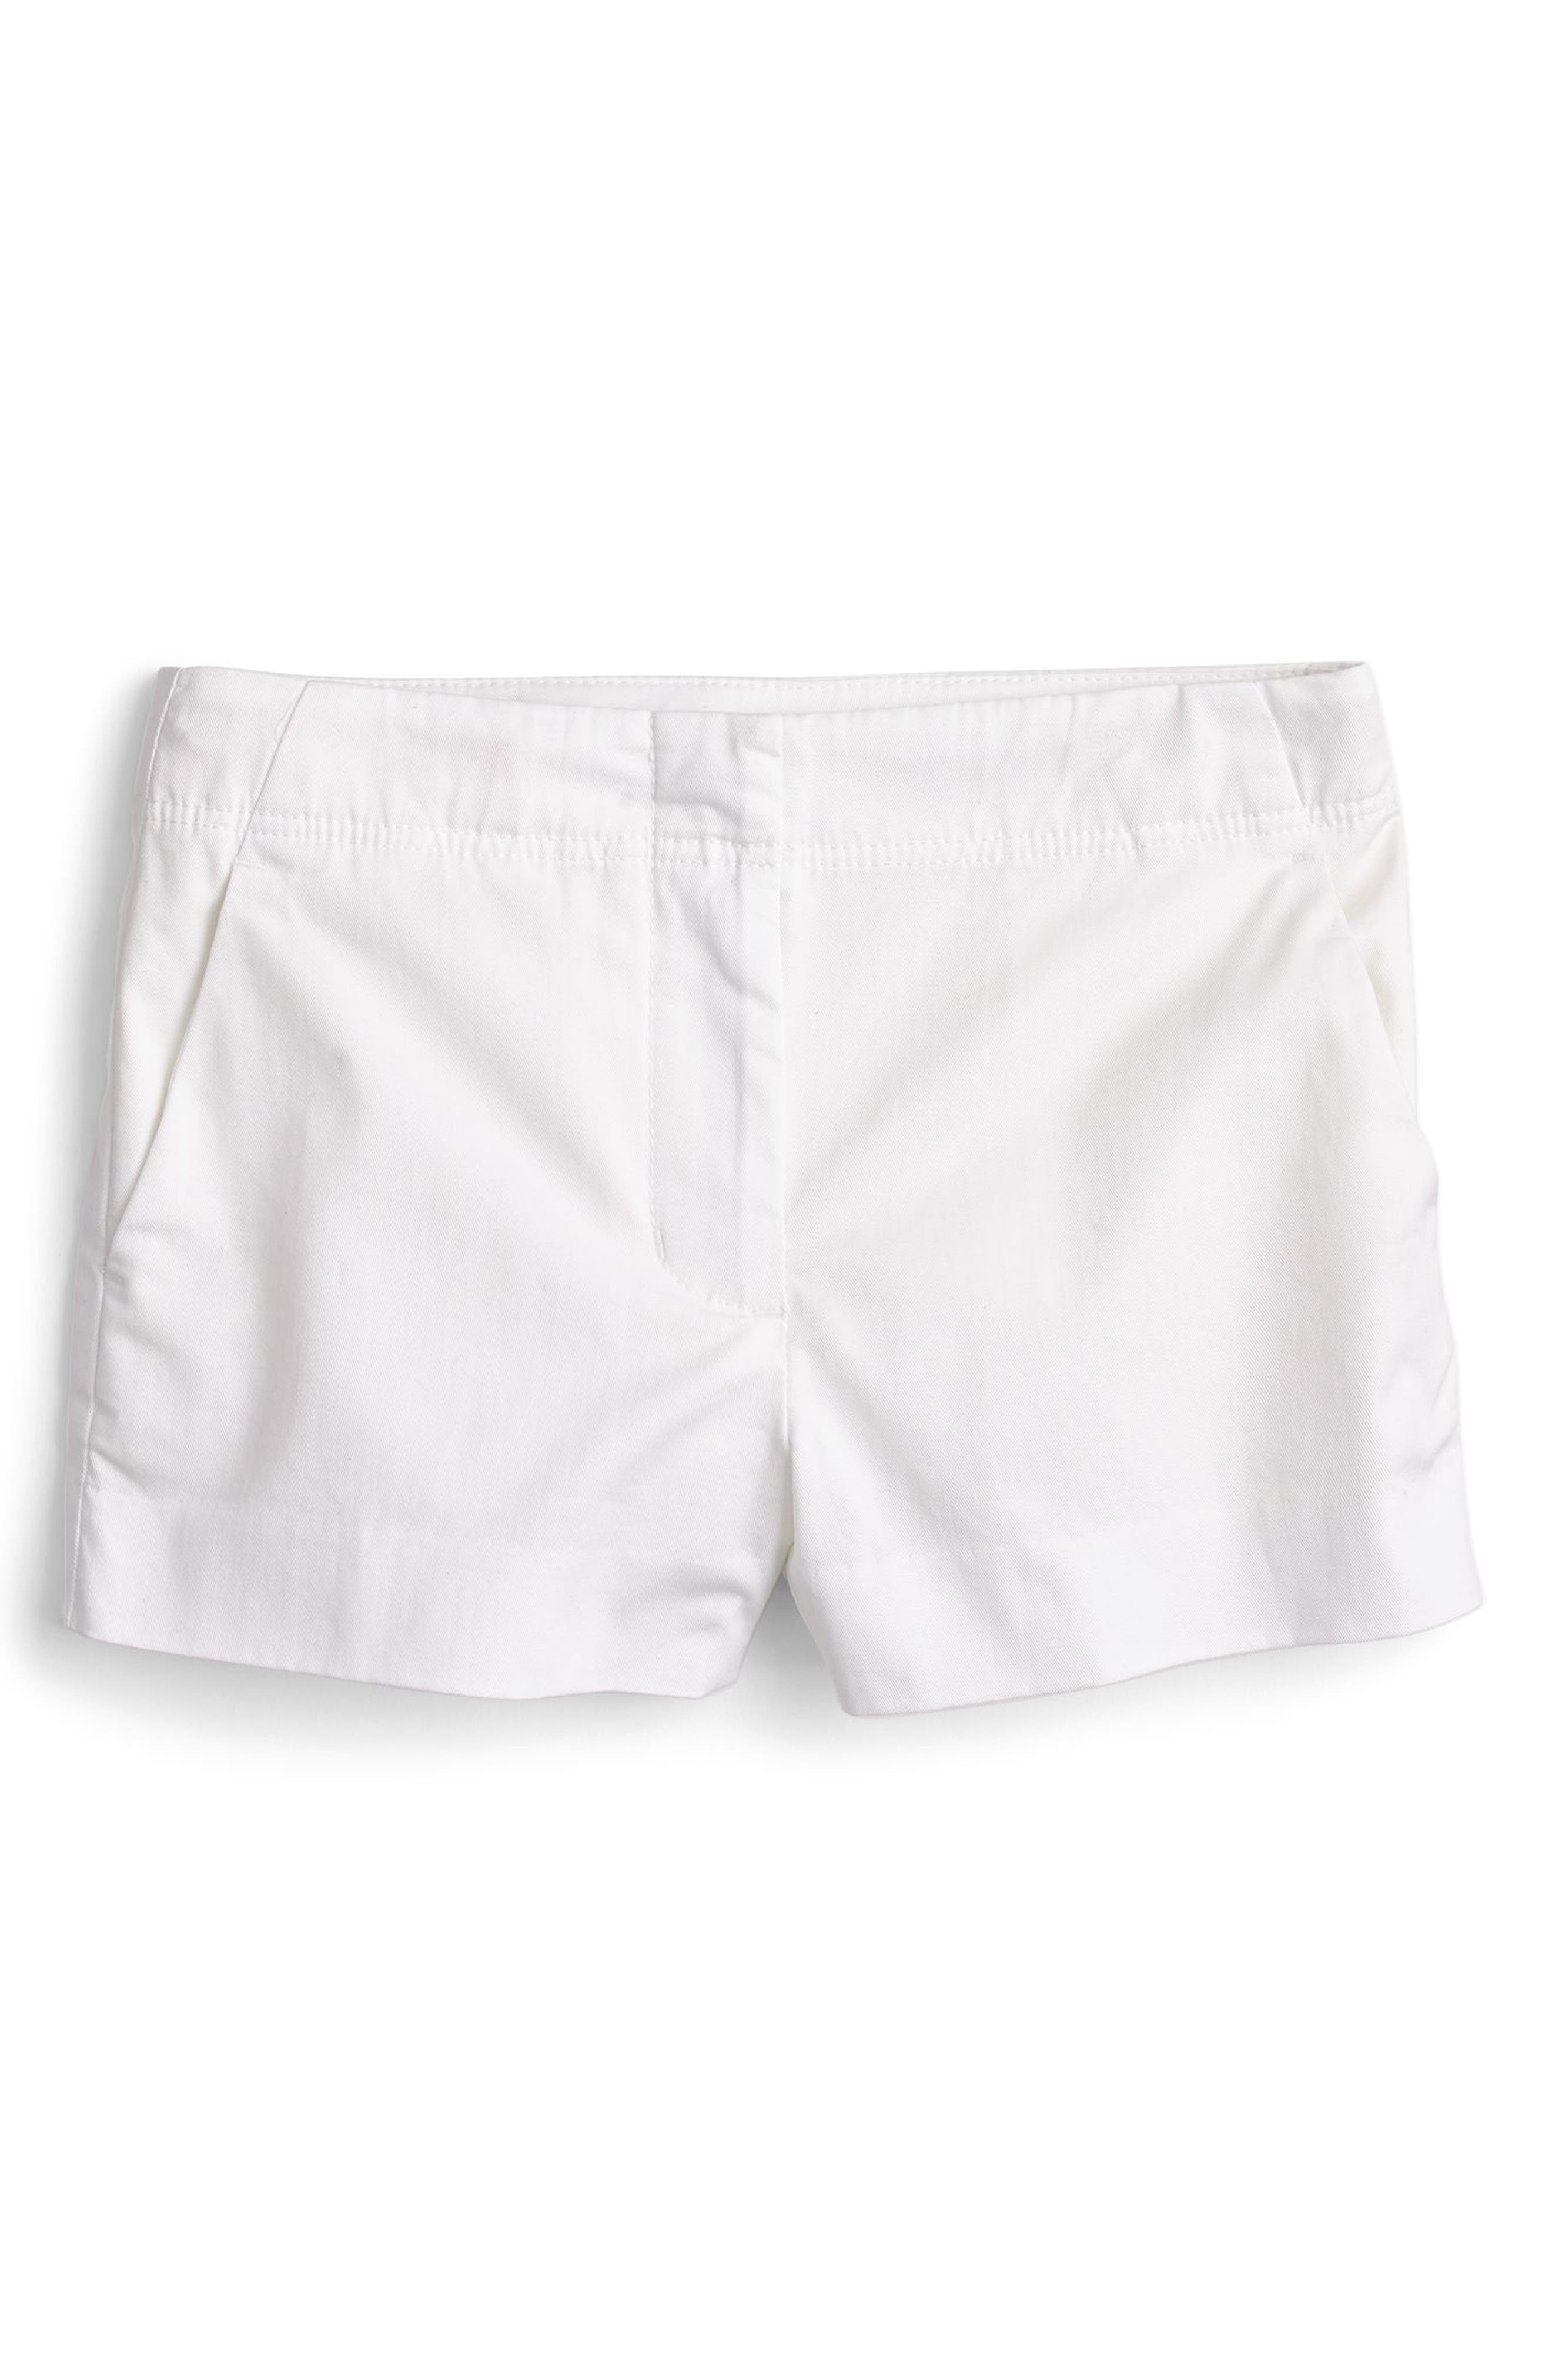 Frankie Stretch Cotton Shorts,                             Main thumbnail 1, color,                             101